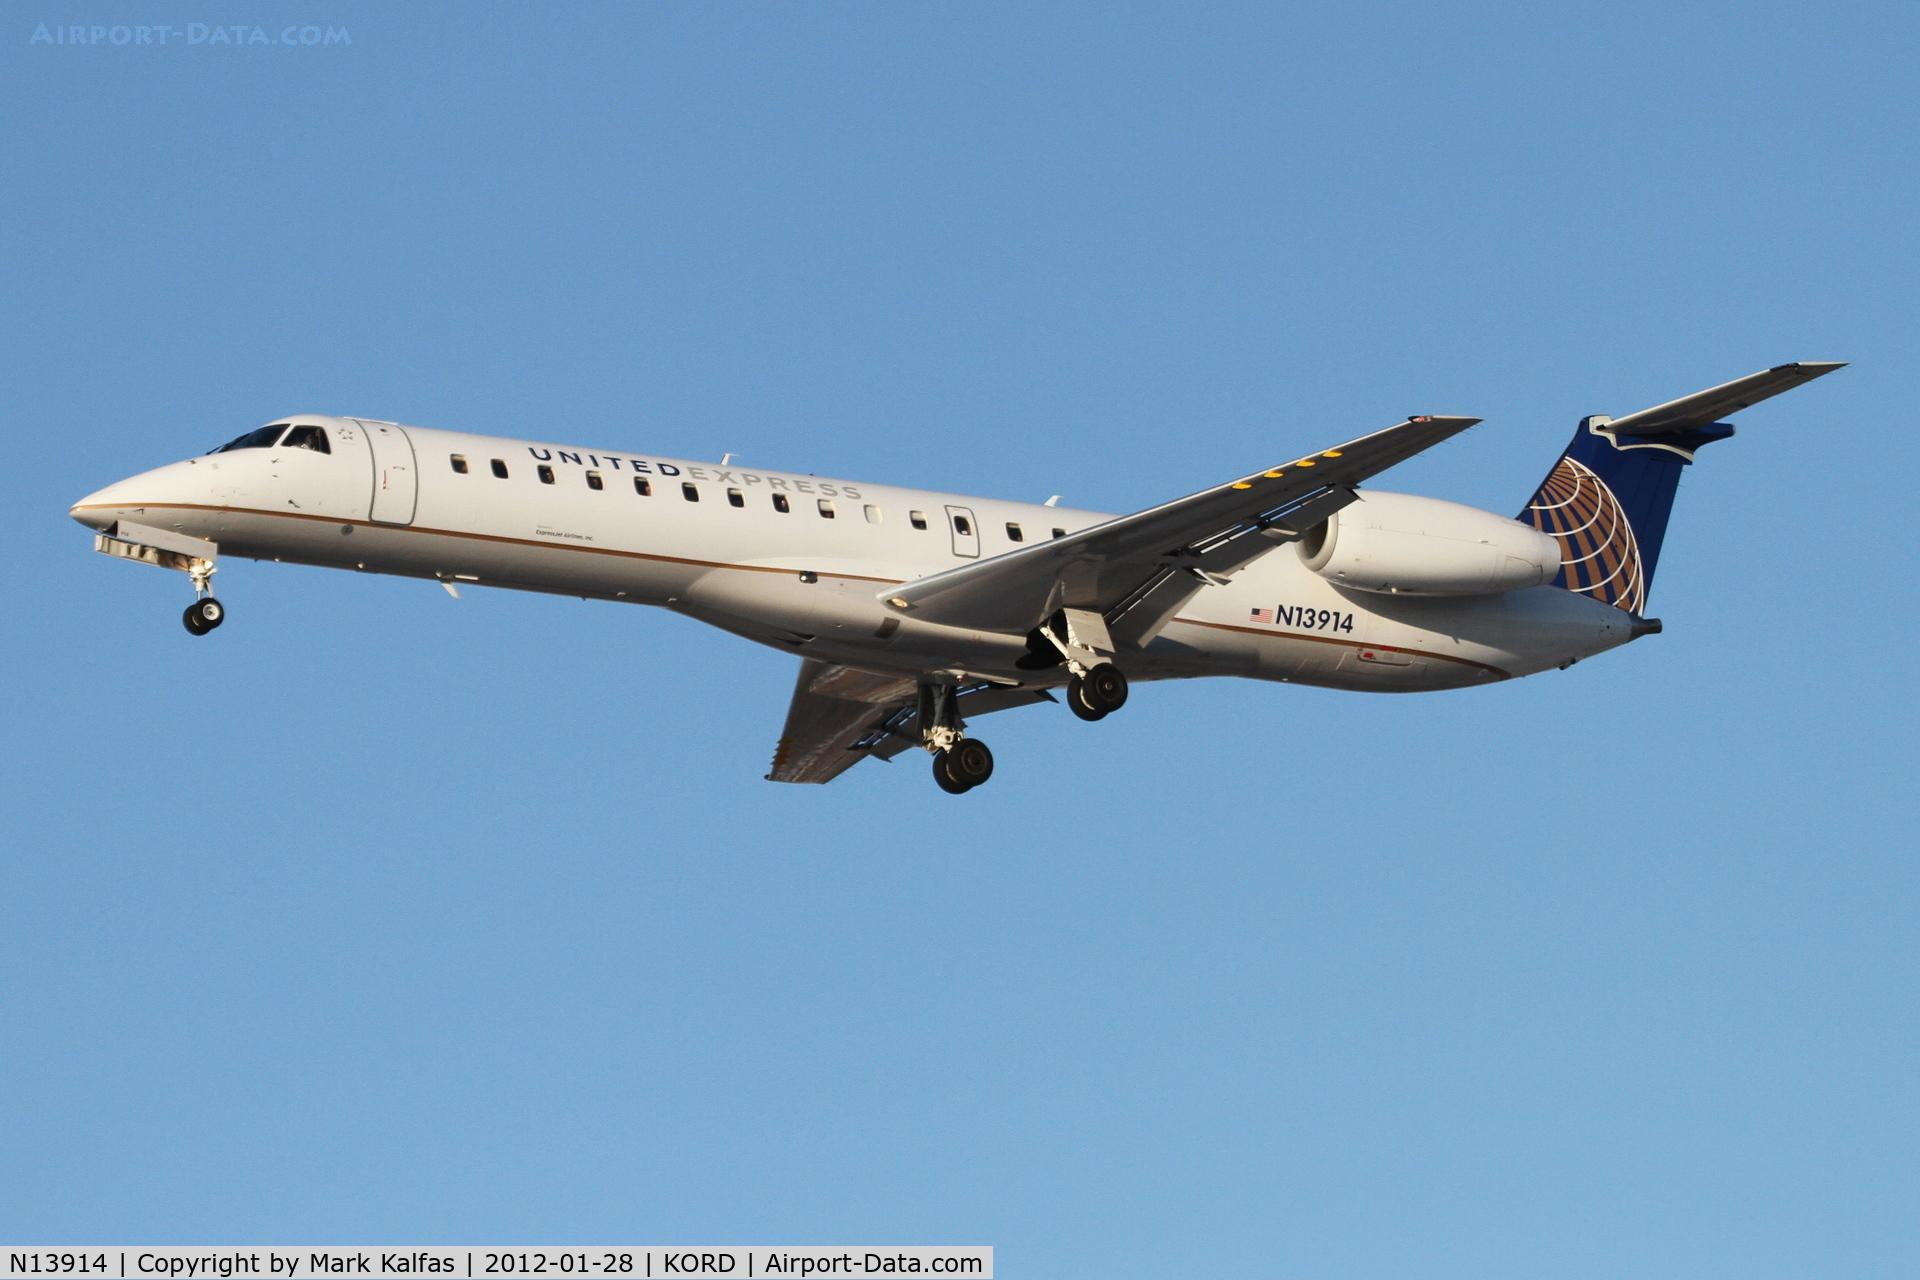 N13914, 2001 Embraer EMB-145LR C/N 145430, ExpressJet/United Express Embraer EMB-145LR, ASQ851B arriving from Fargo - KFSD, RWY 28 approach KORD.